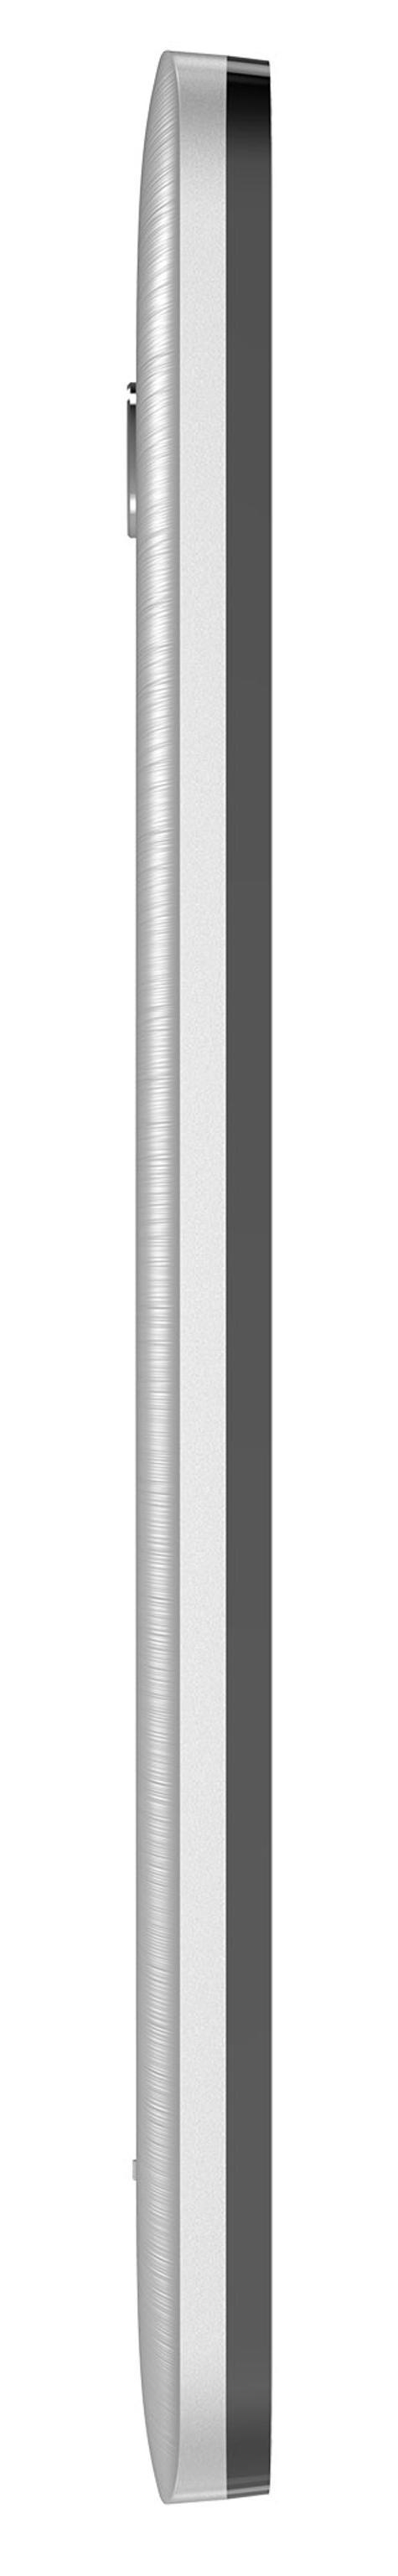 Alcatel POP 4 Plus perfil lateral